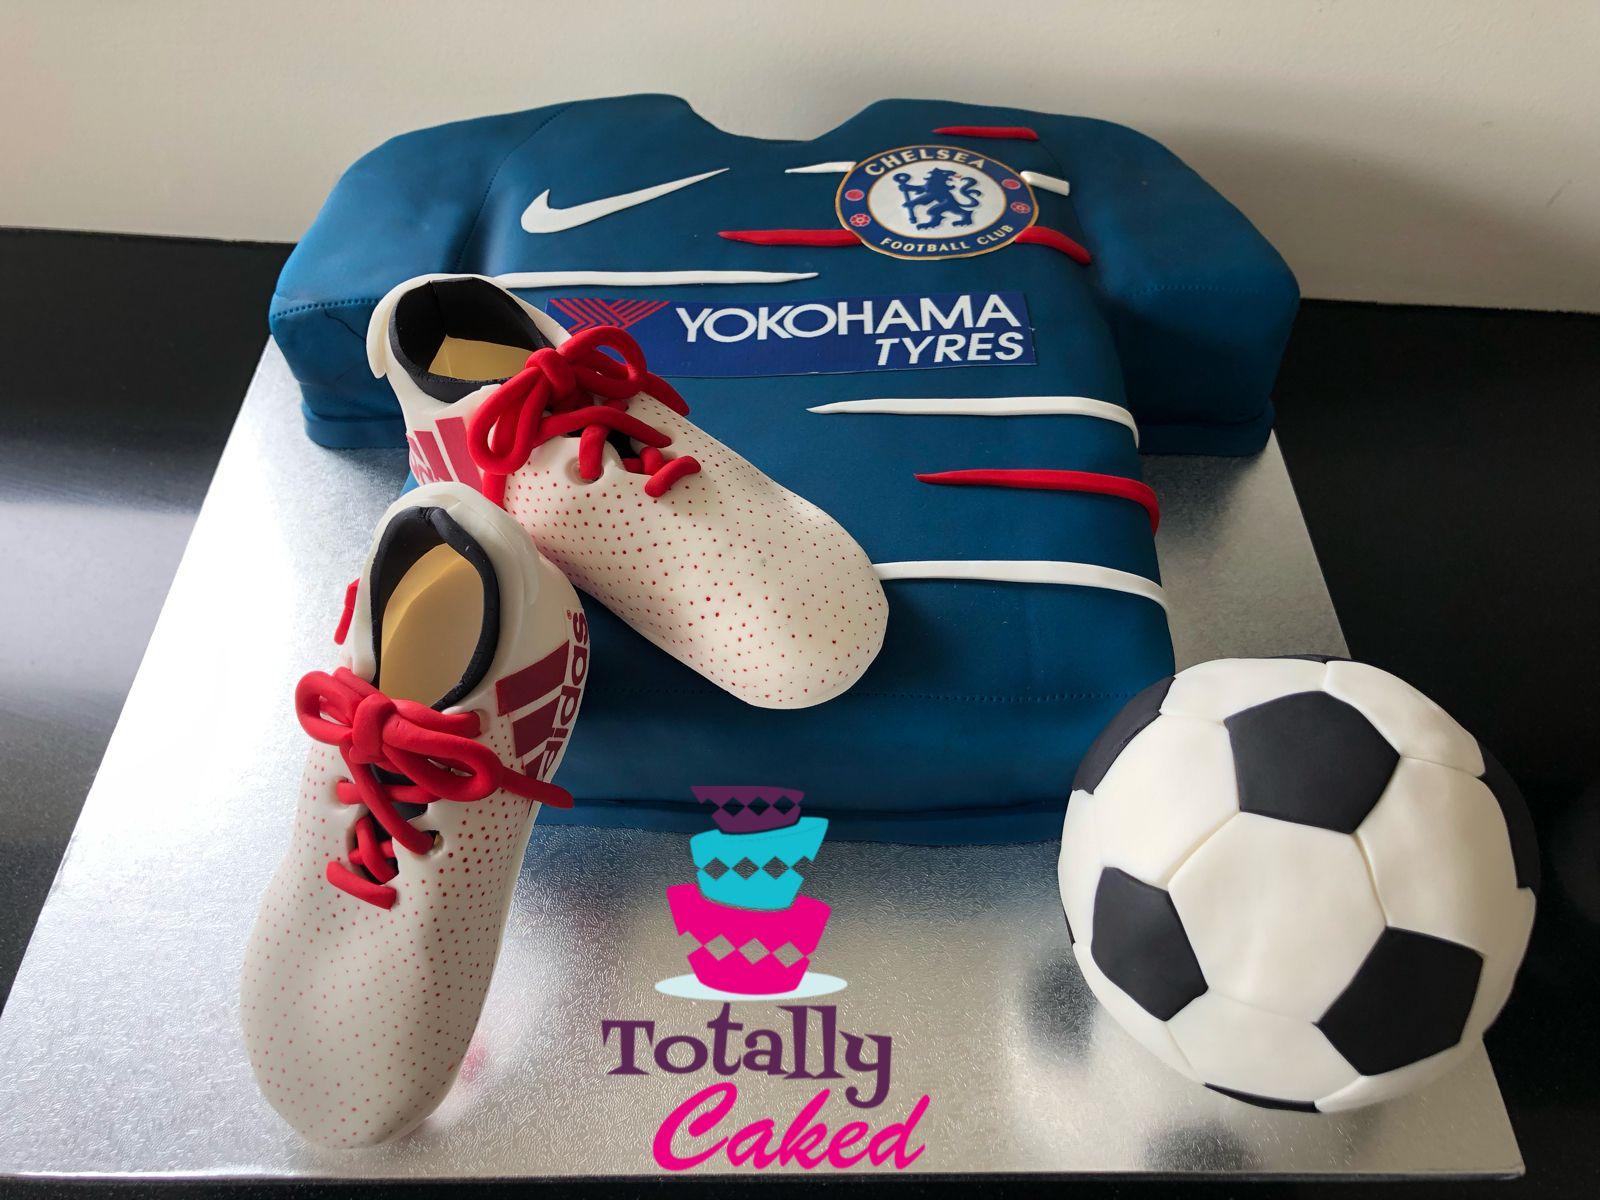 Chelsea football shirt cake shirt cake chelsea football